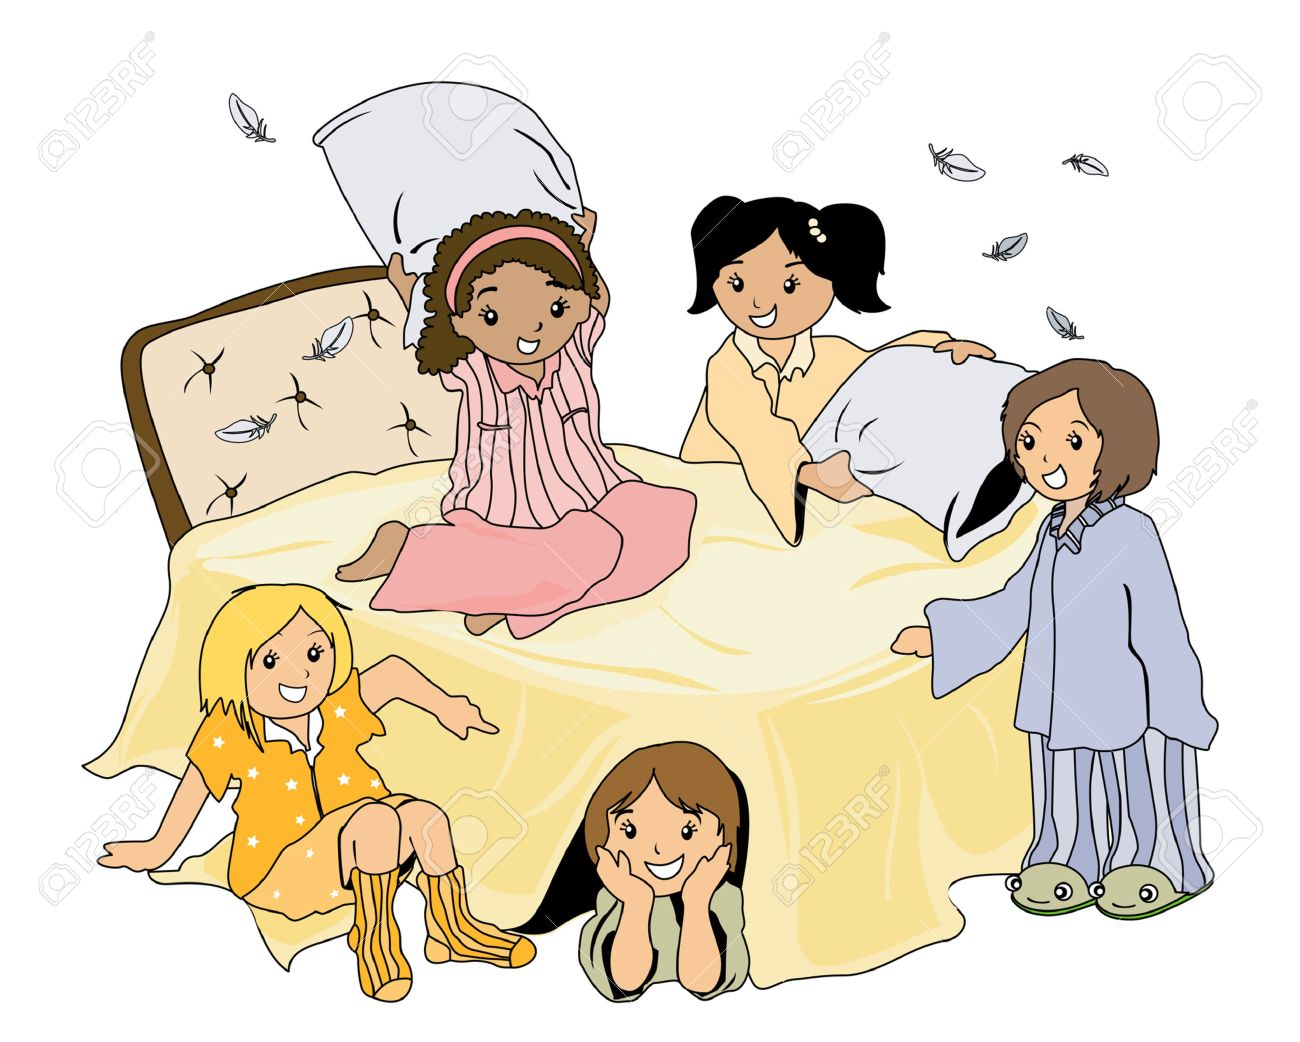 pajama party royalty free cliparts vectors and stock illustration rh 123rf com Pajama Day pajama party clipart free